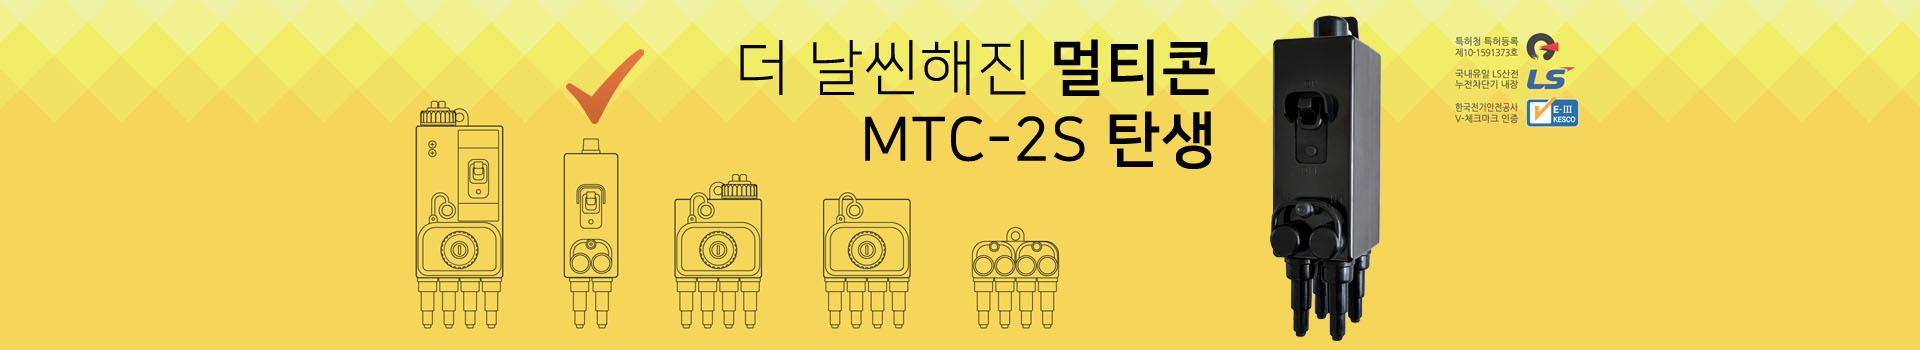 strip_mtc-2s